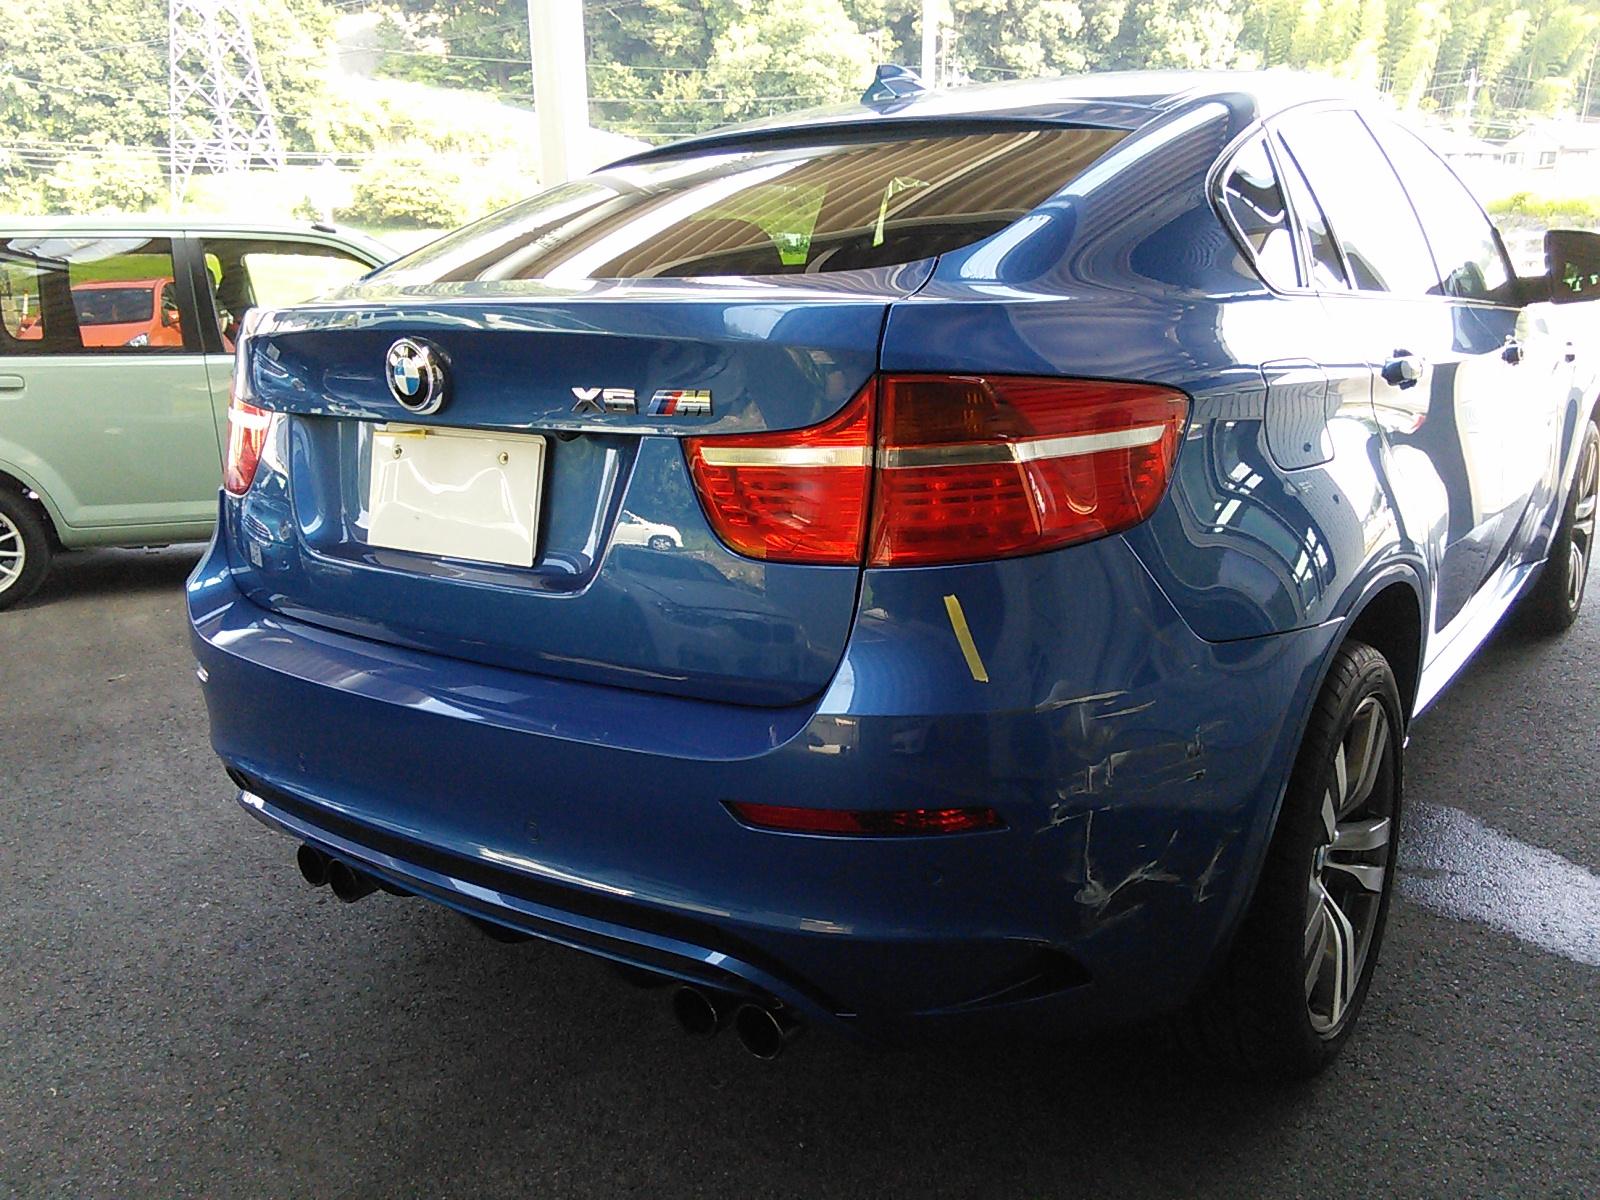 BMW  X6 リアバンパー修理 台風来ないと良いなぁ  豊田市  板金塗装